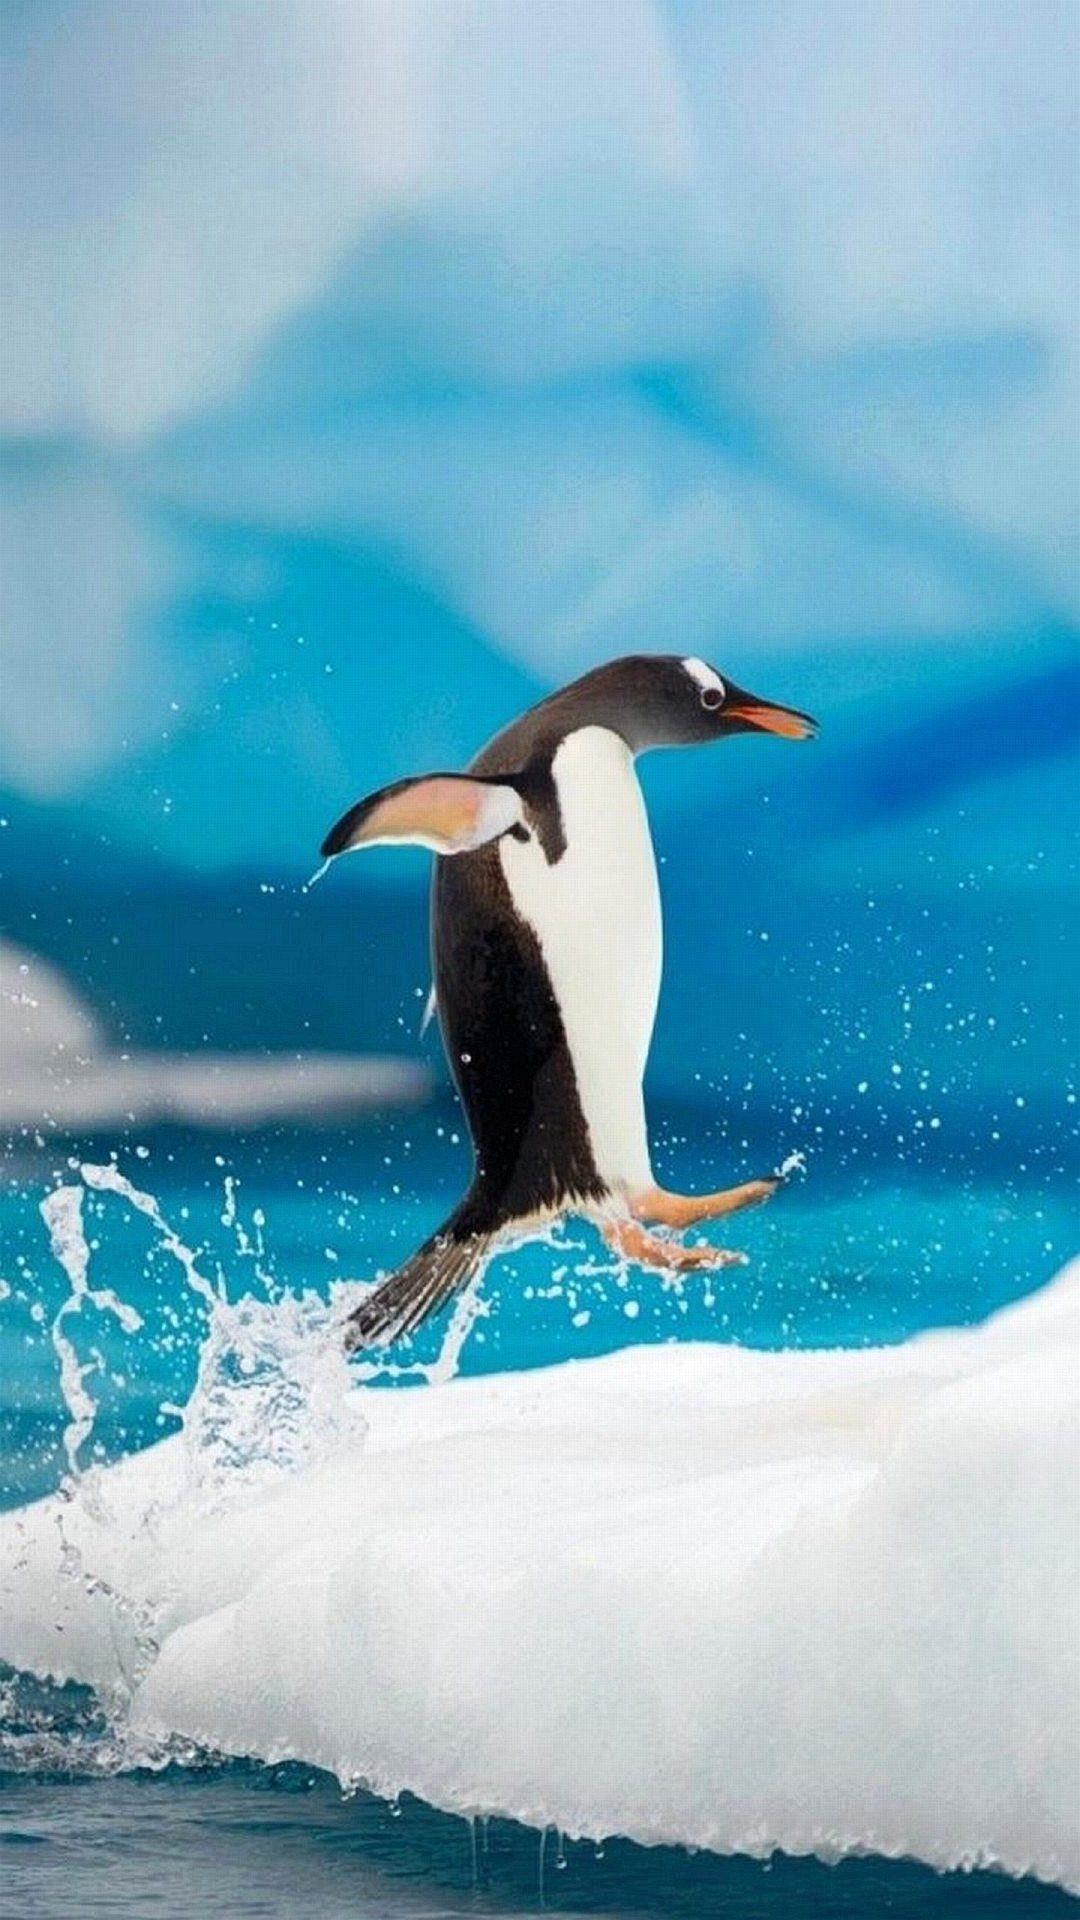 Penguin iPhone 7 Plus Wallpaper iPhoneWallpapers Penguins 1080x1920